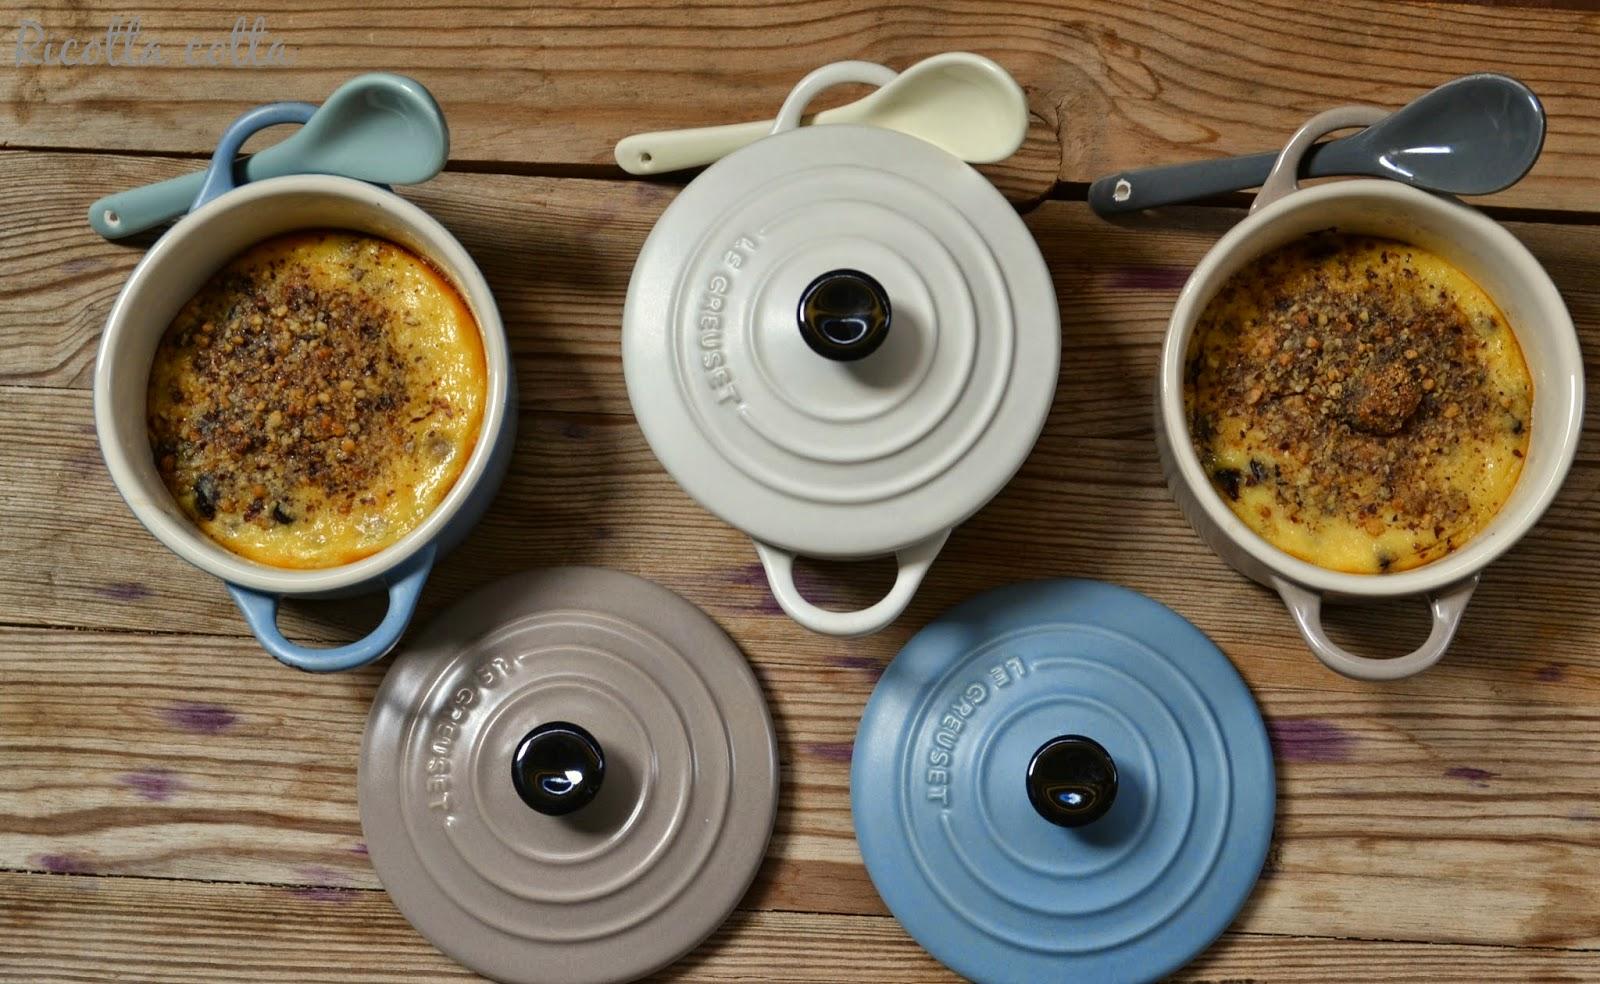 cucina di barbara food blog - blog di cucina ricette: ricetta ... - Blog Di Cucina Dolci